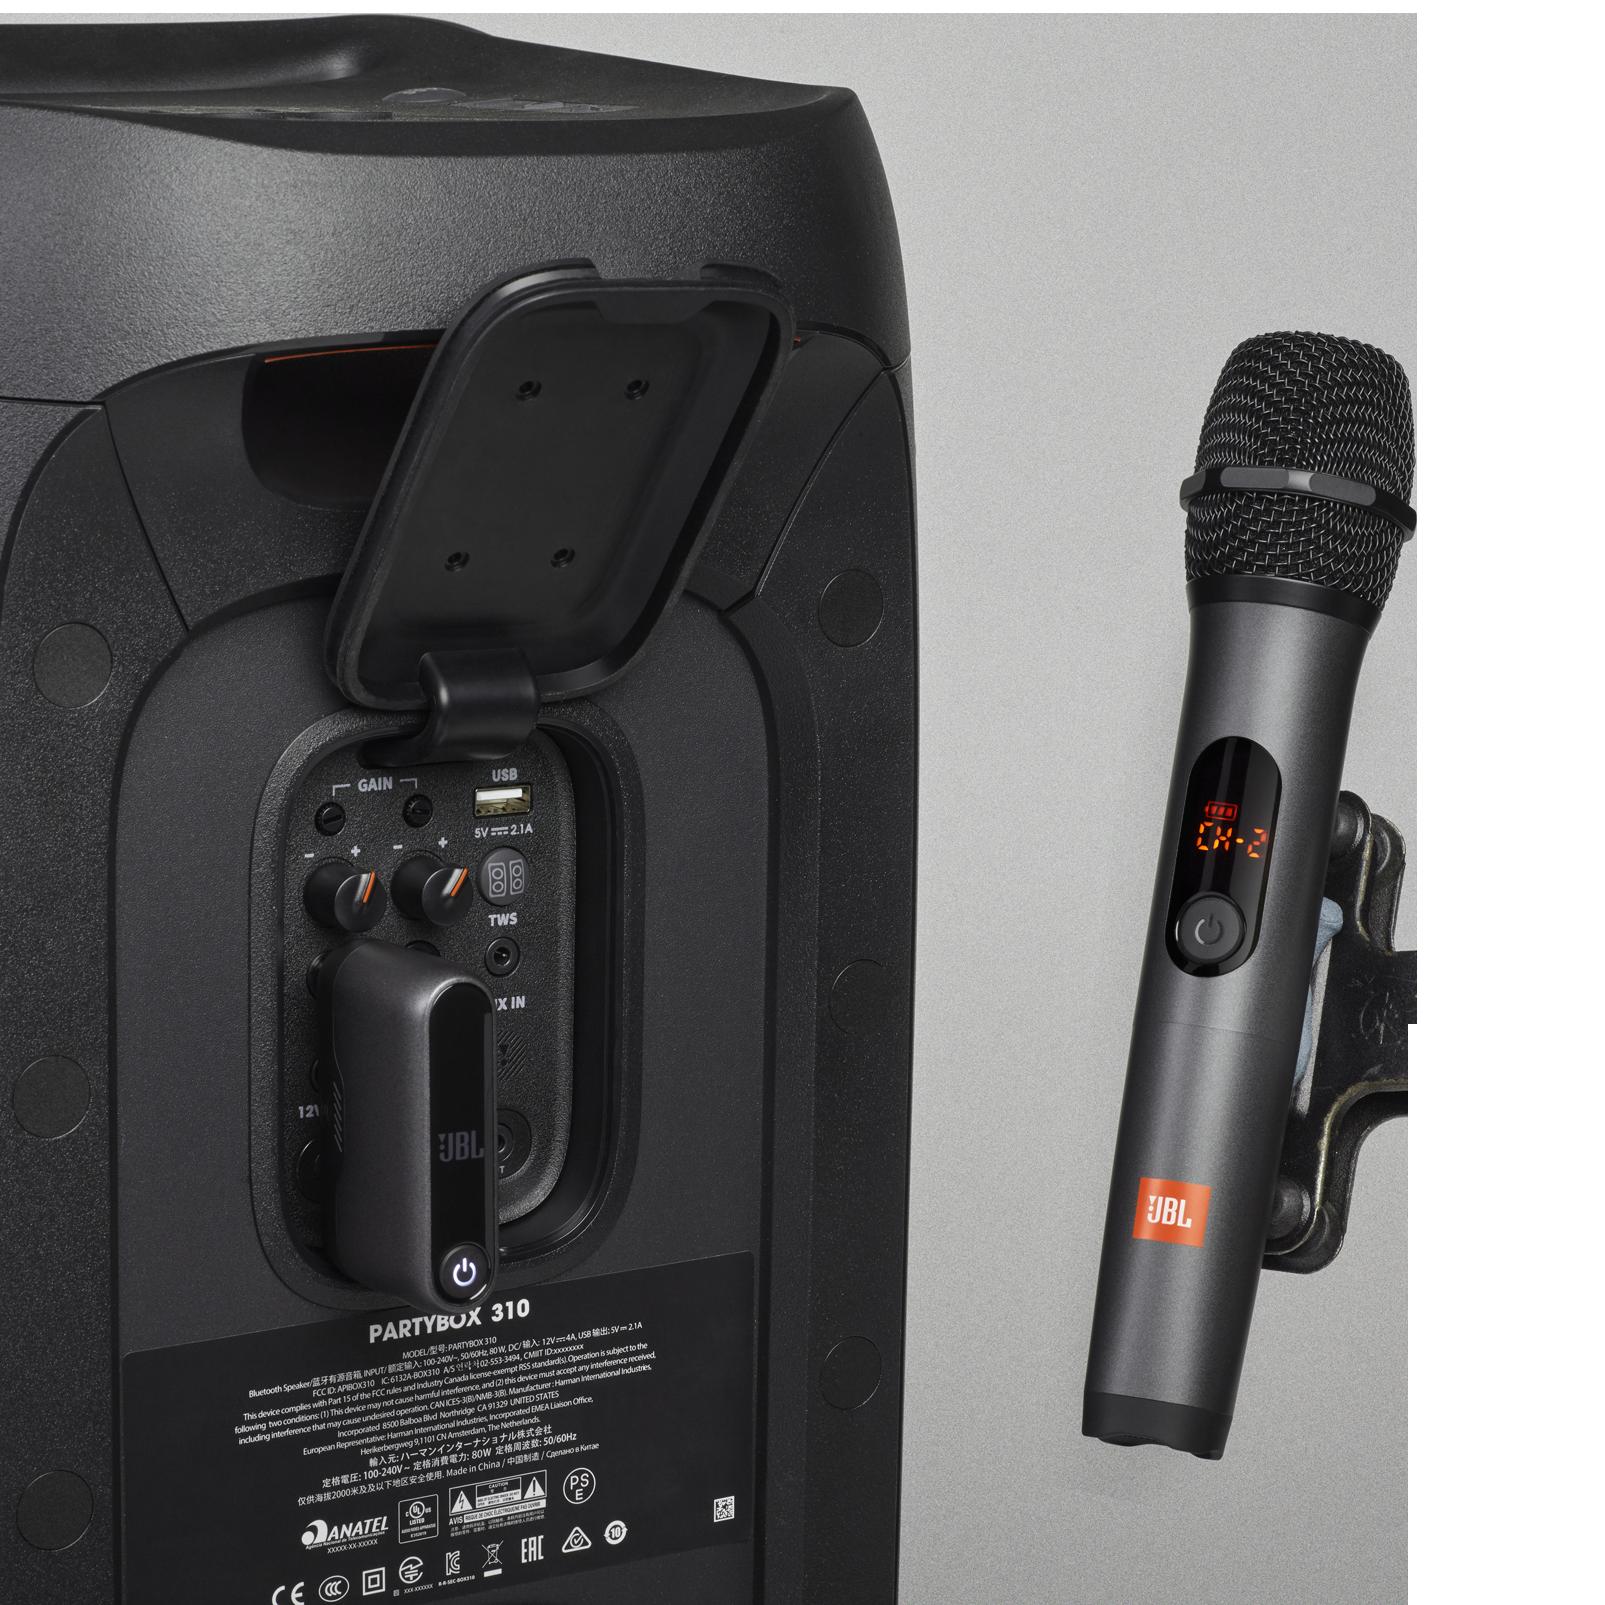 JBL Wireless Microphone Set - Black - Wireless two microphone system - Detailshot 1